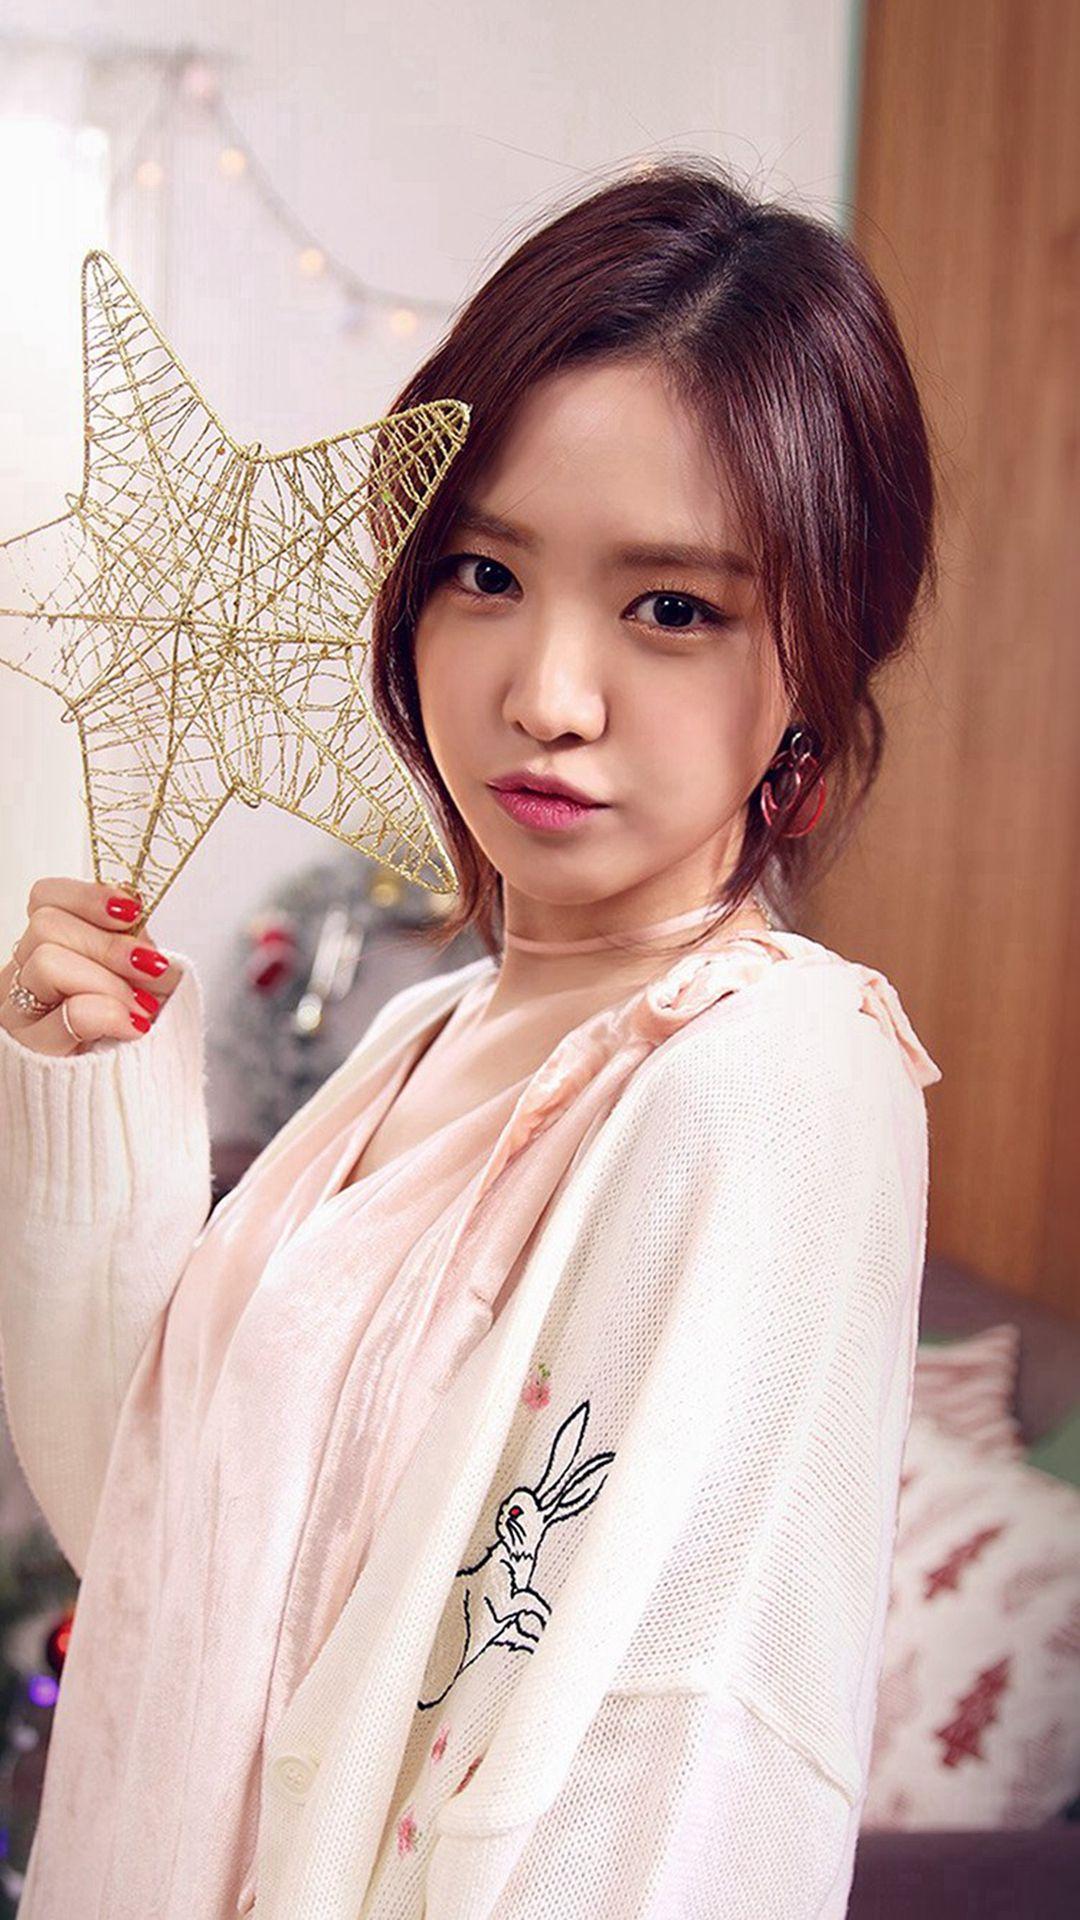 Kpop Girl Cute Christmas Apink iPhone 6 plus wallpaper